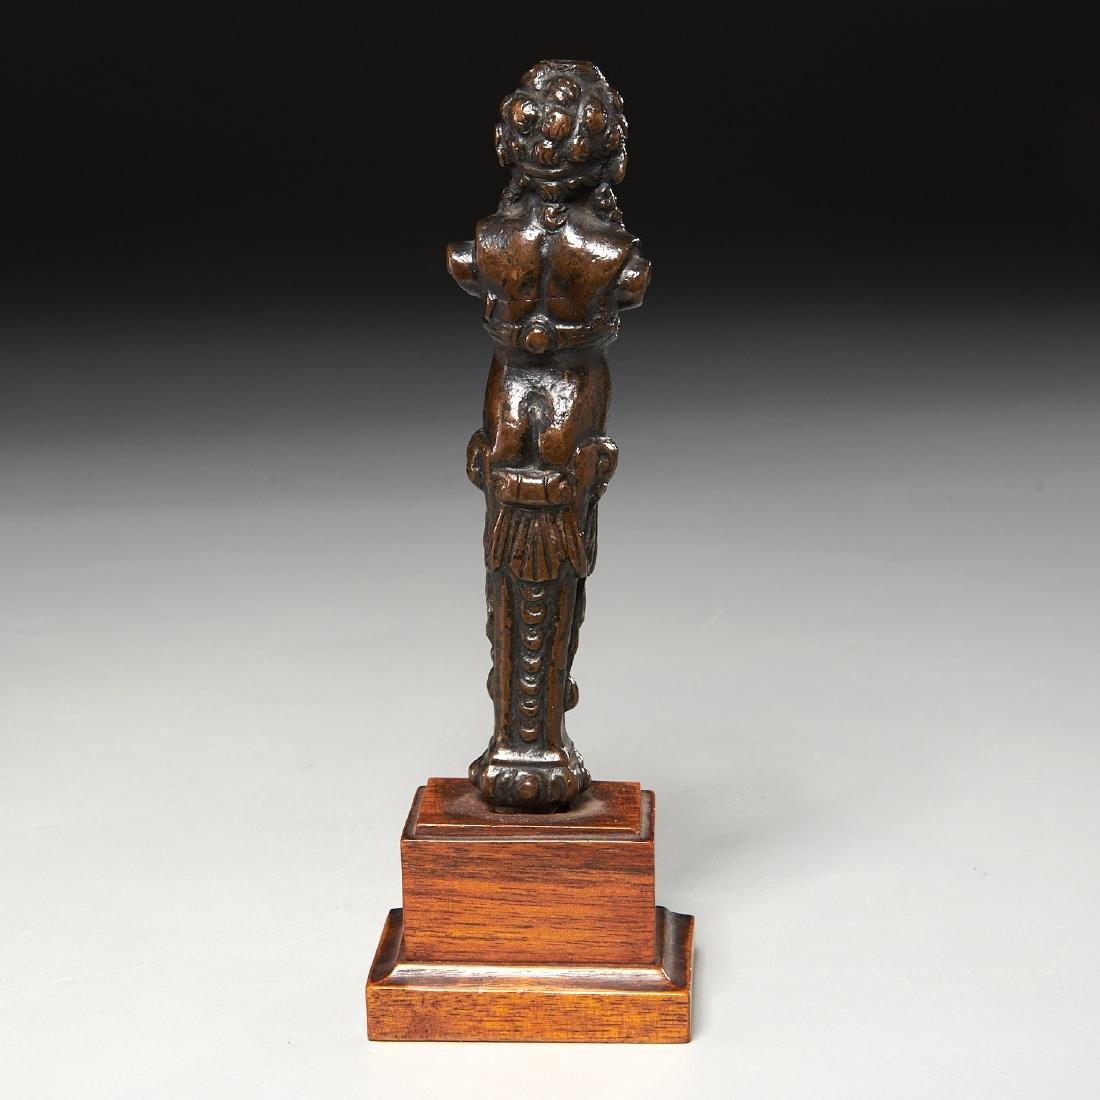 Renaissance era cabinet bronze - 6